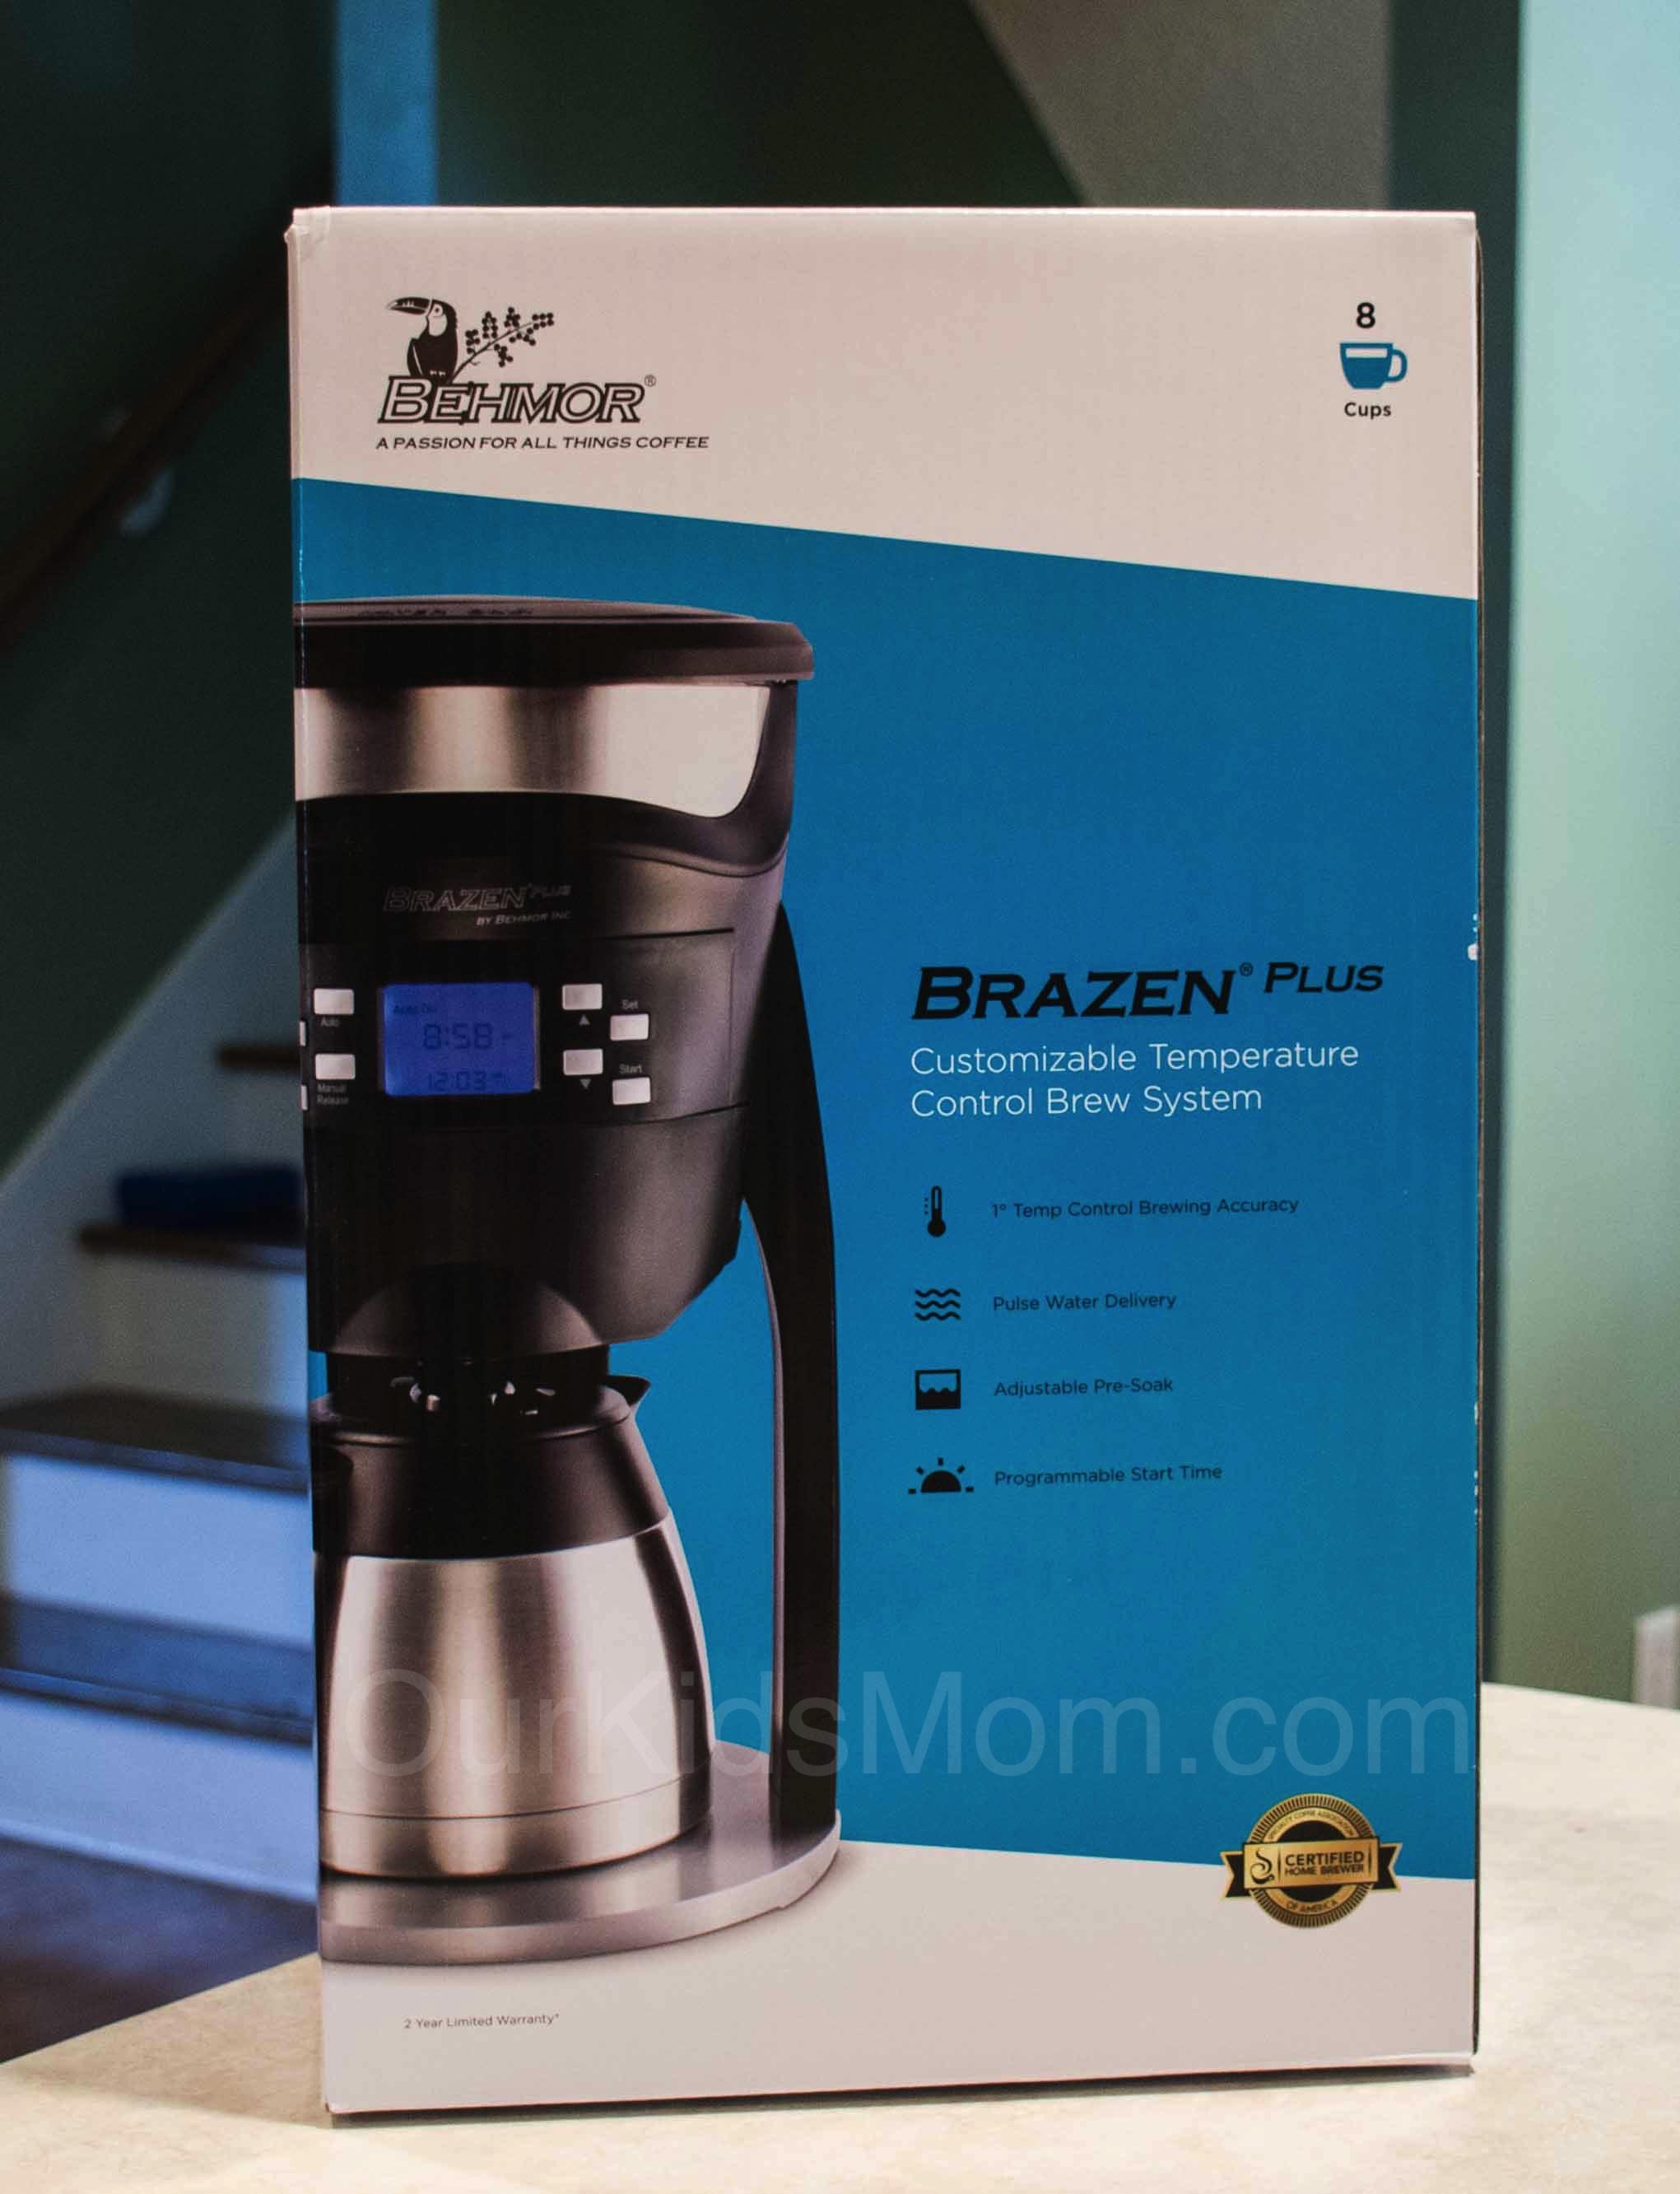 Brazen Plus Customizable Temperature Control Brew